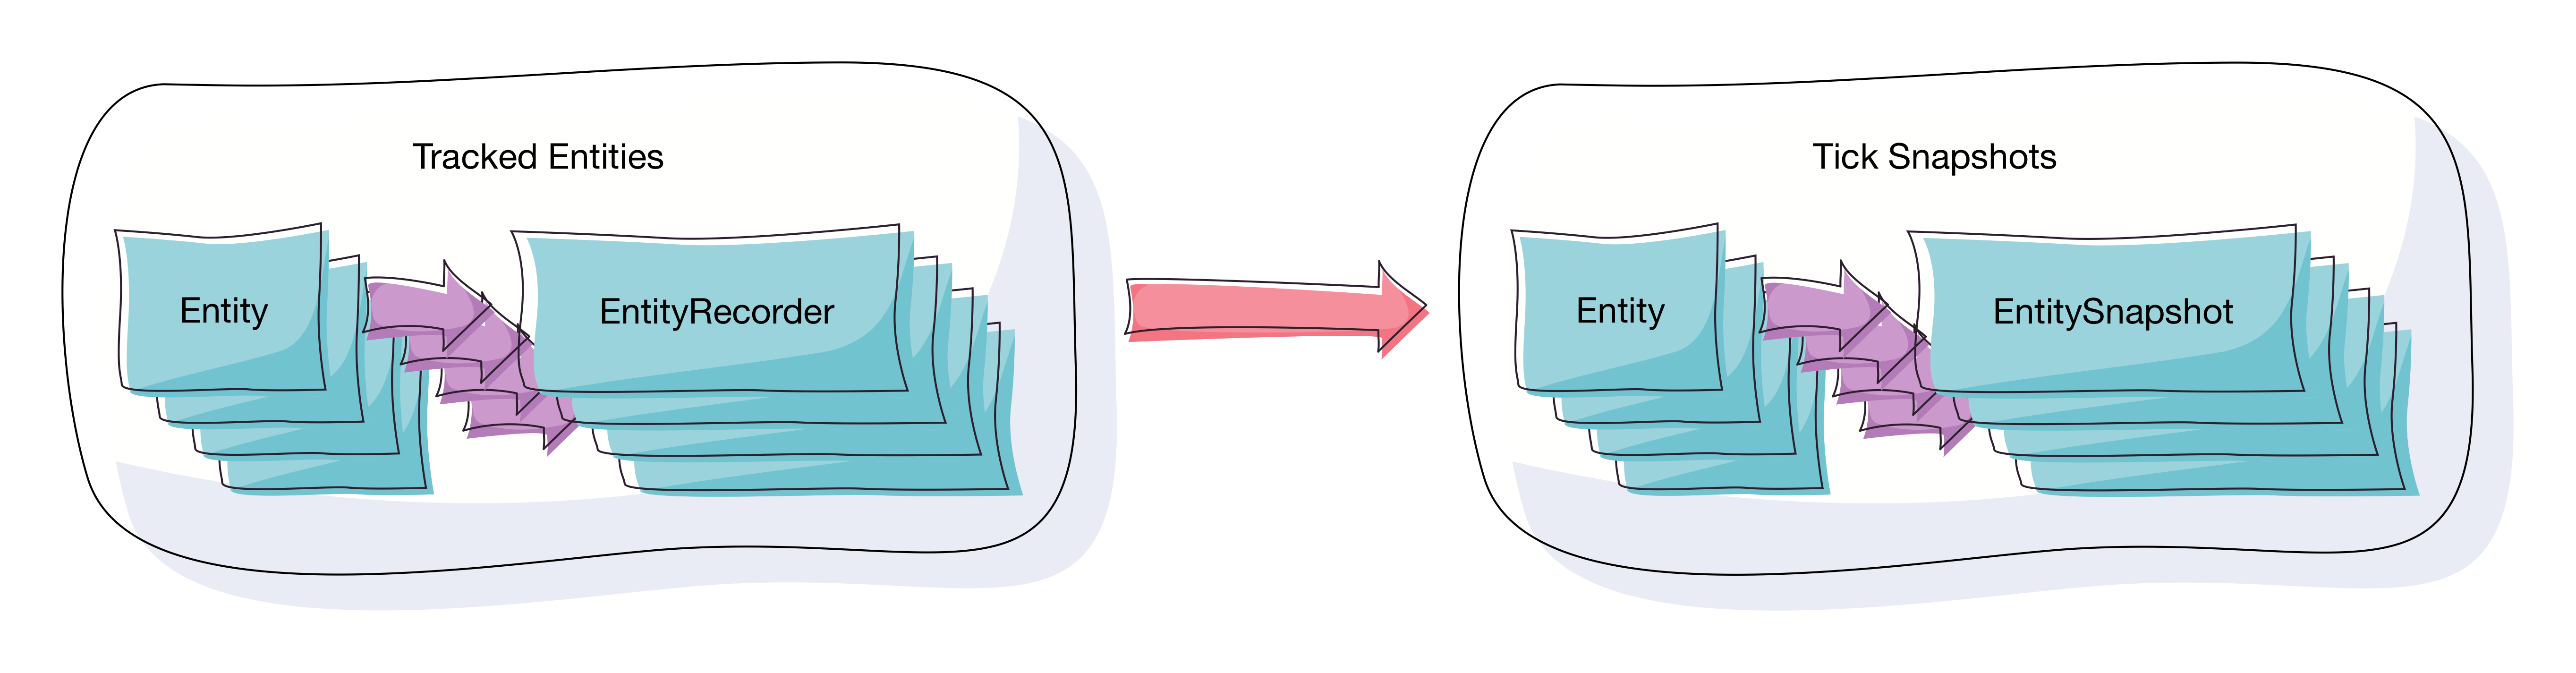 JVM 应用监控框架 Kamon